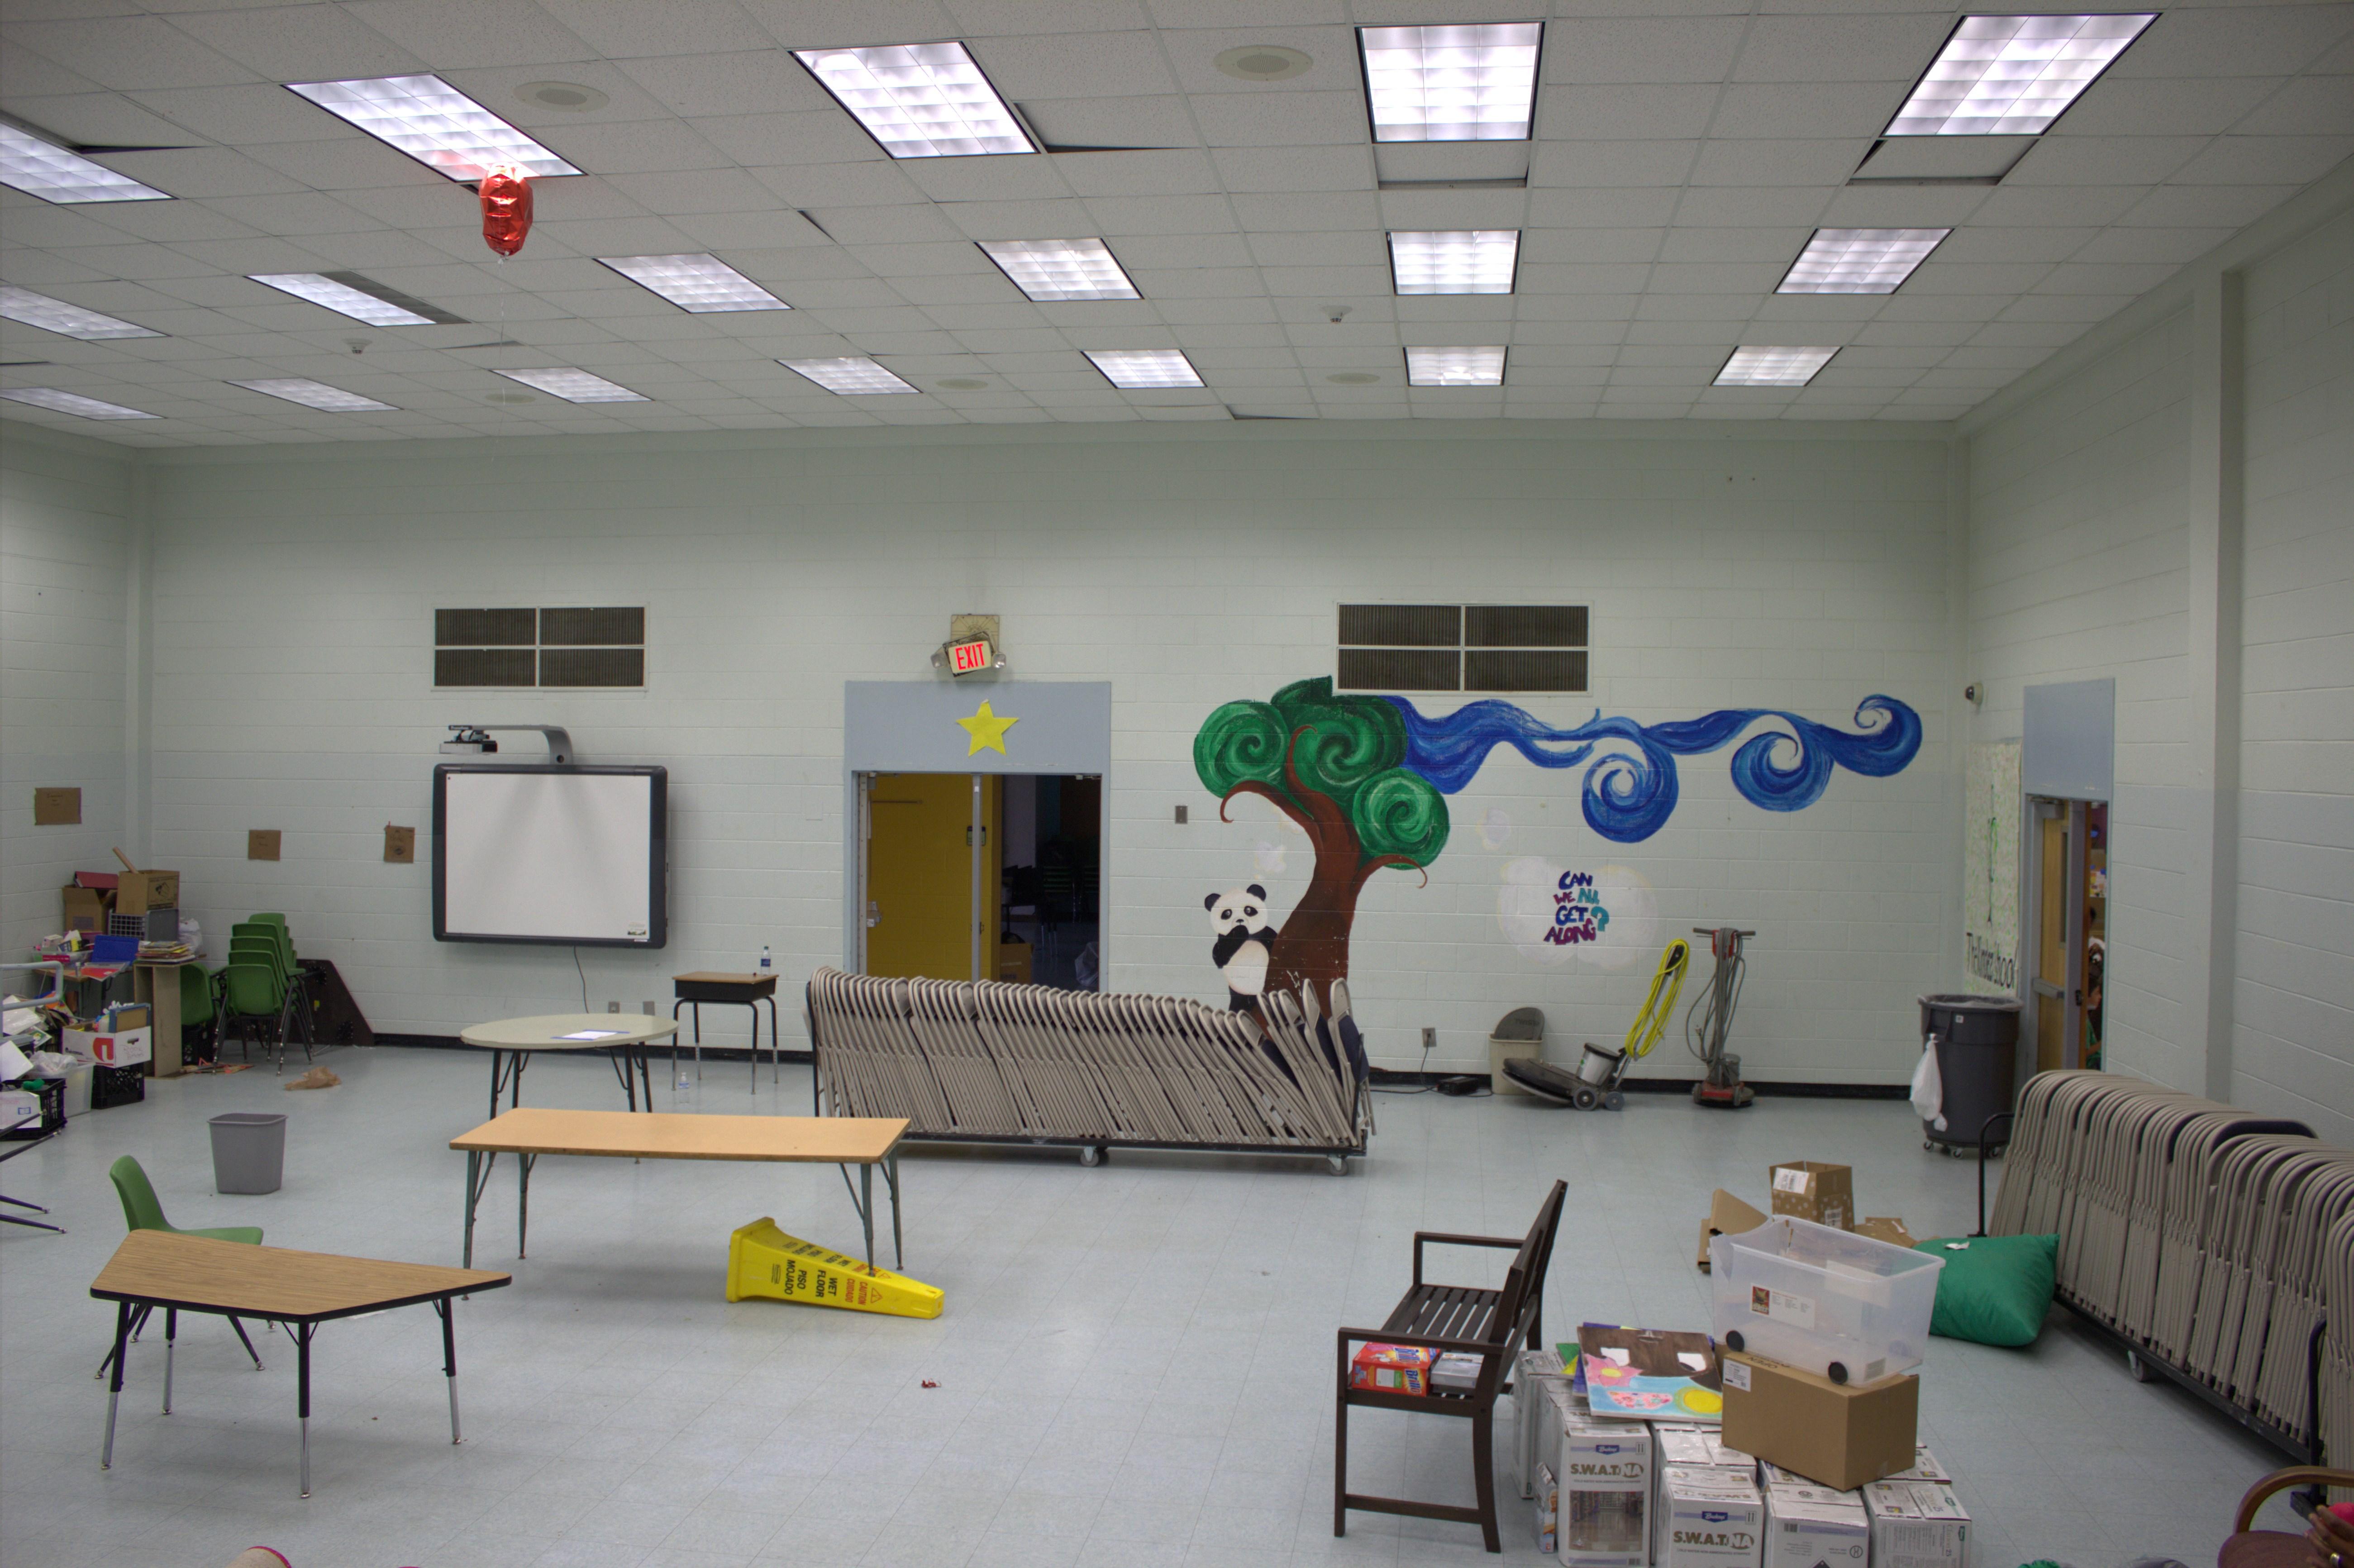 Interior Exterior Painting The Kindezi School In Atlanta GA